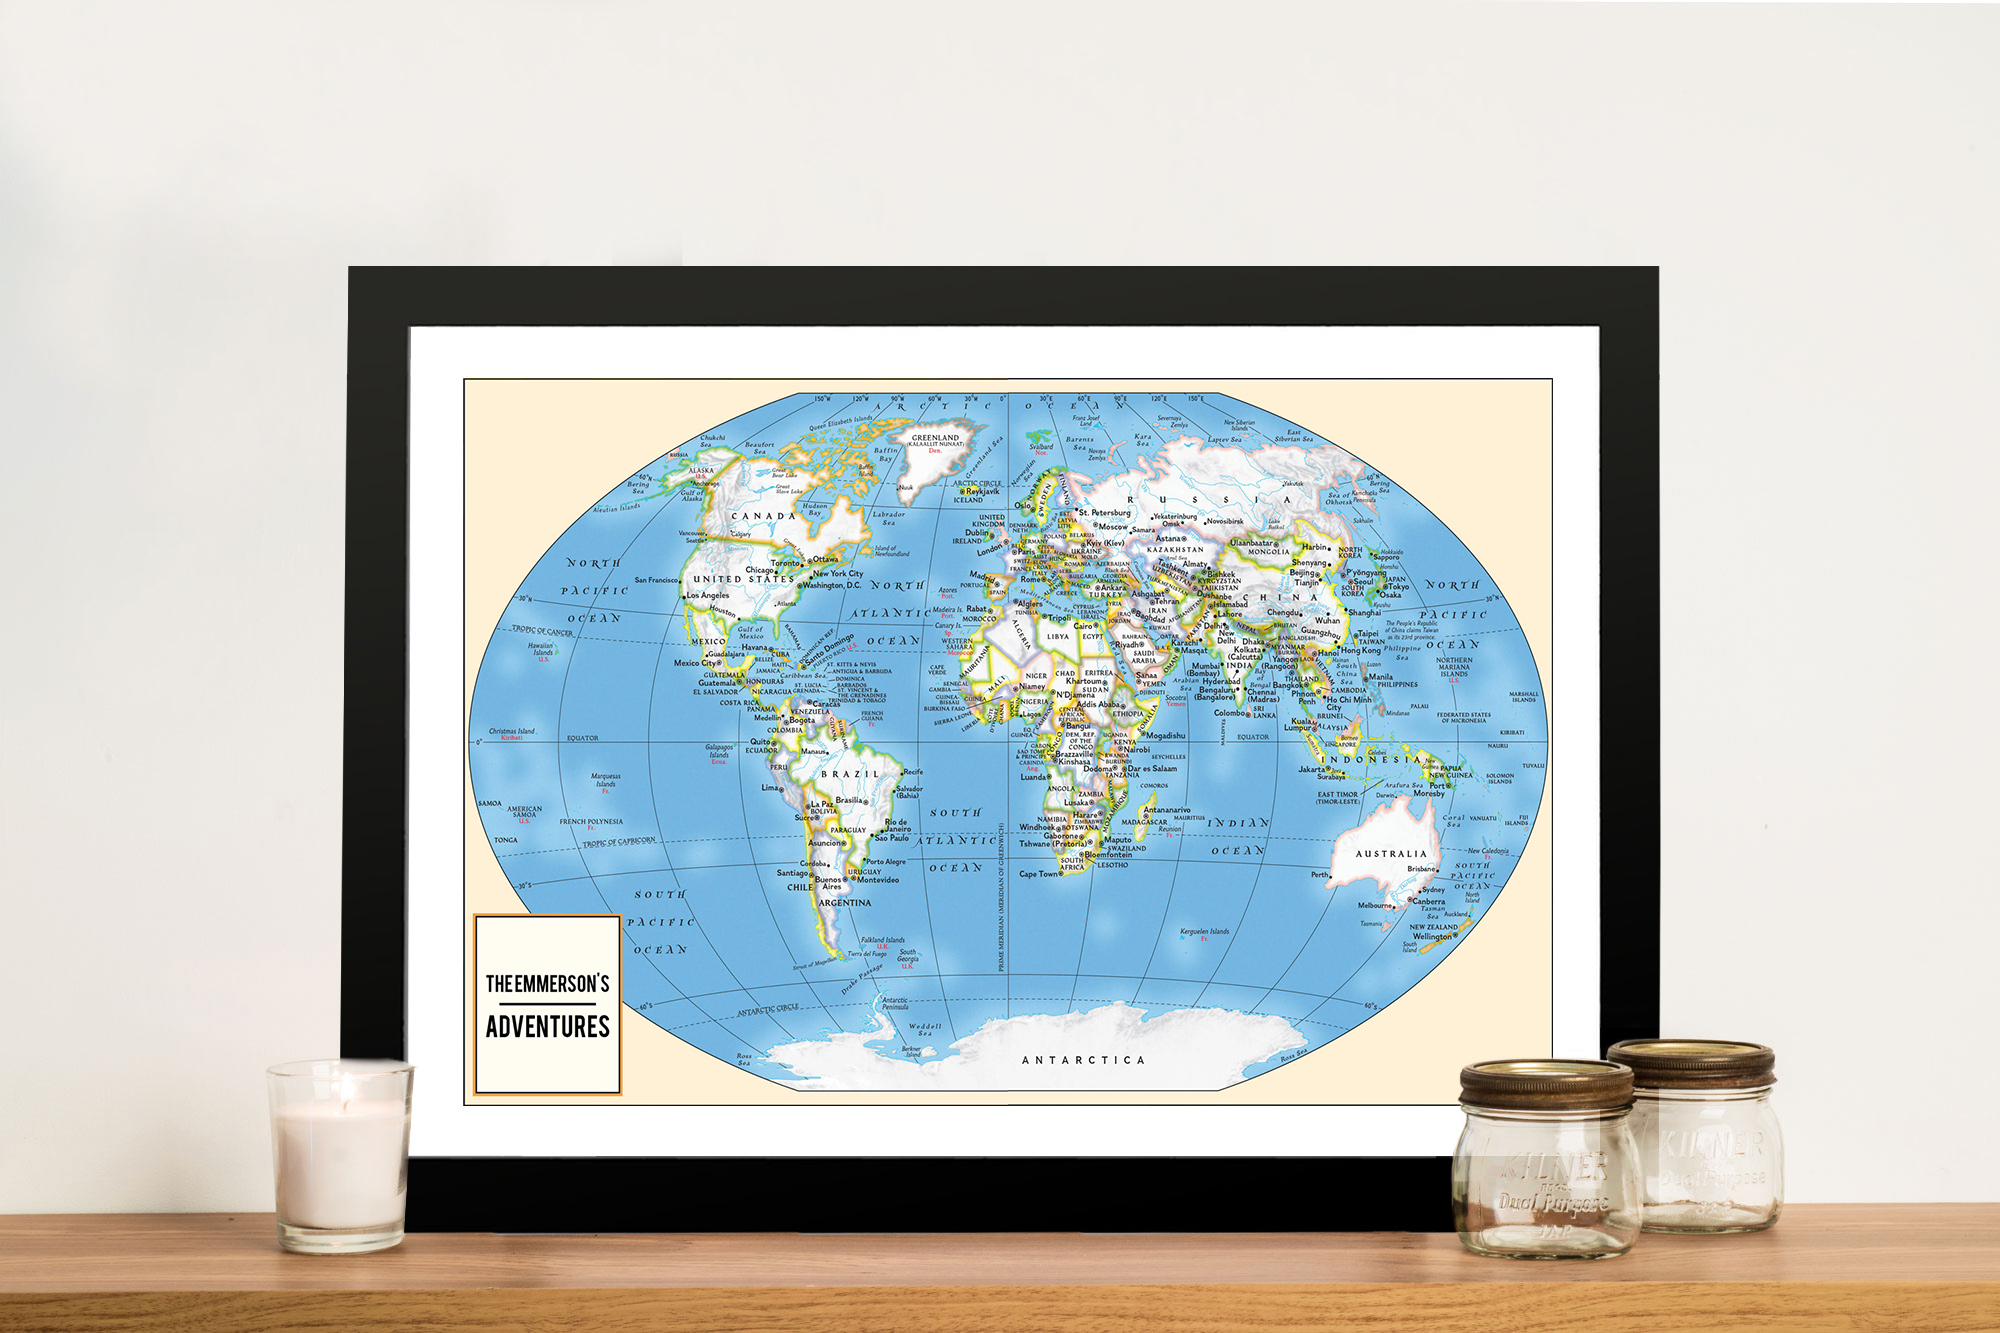 Personalised push pin world travel map art australia adventurer push pin world map framed art push pin world map adventurer gumiabroncs Choice Image